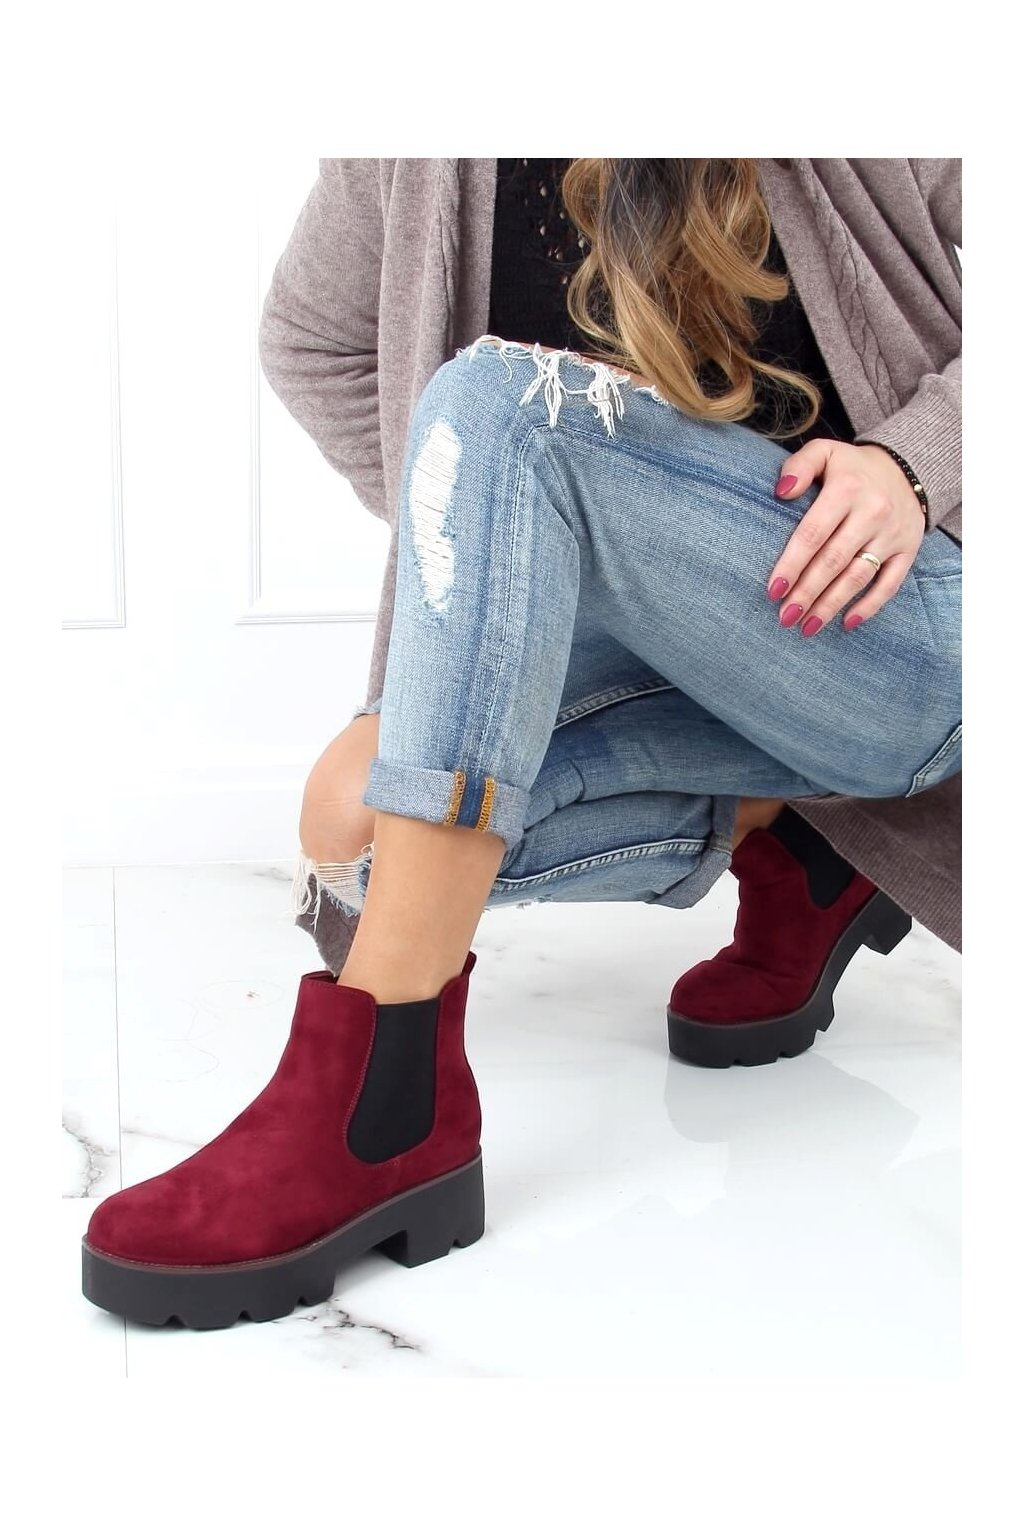 Dámske členkové topánky červené na širokom podpätku 8B987